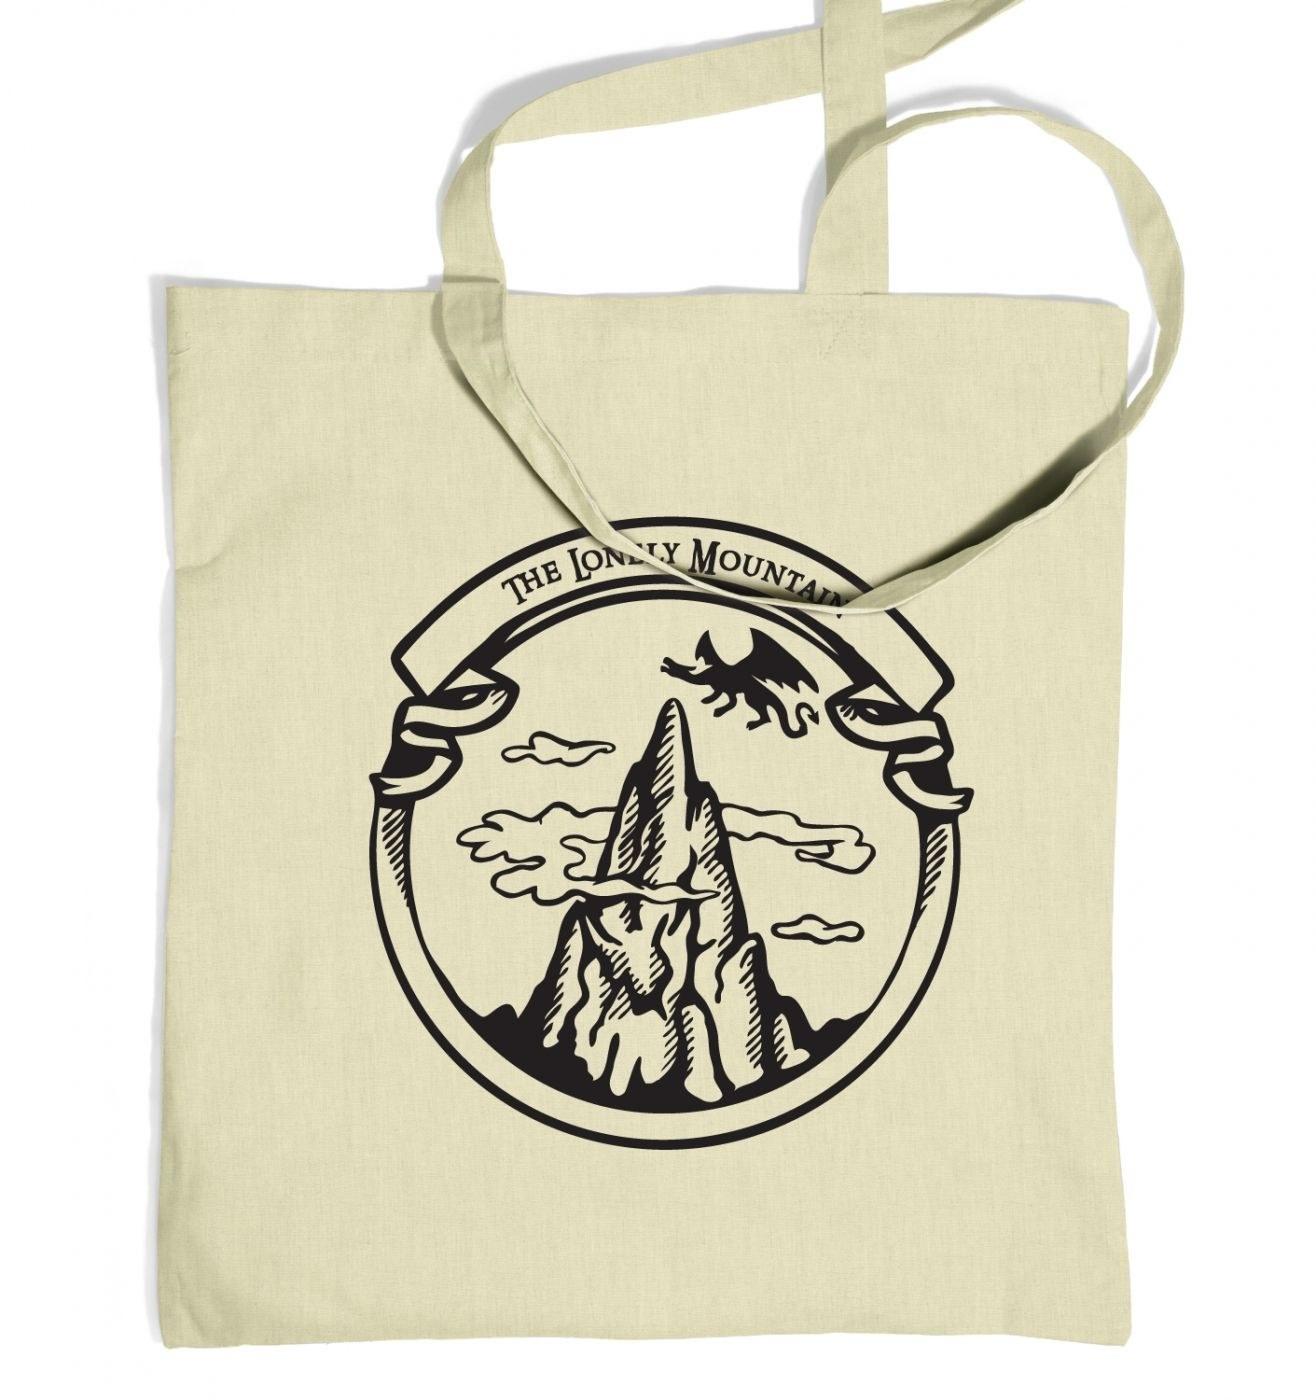 The Dragon Mountain tote bag